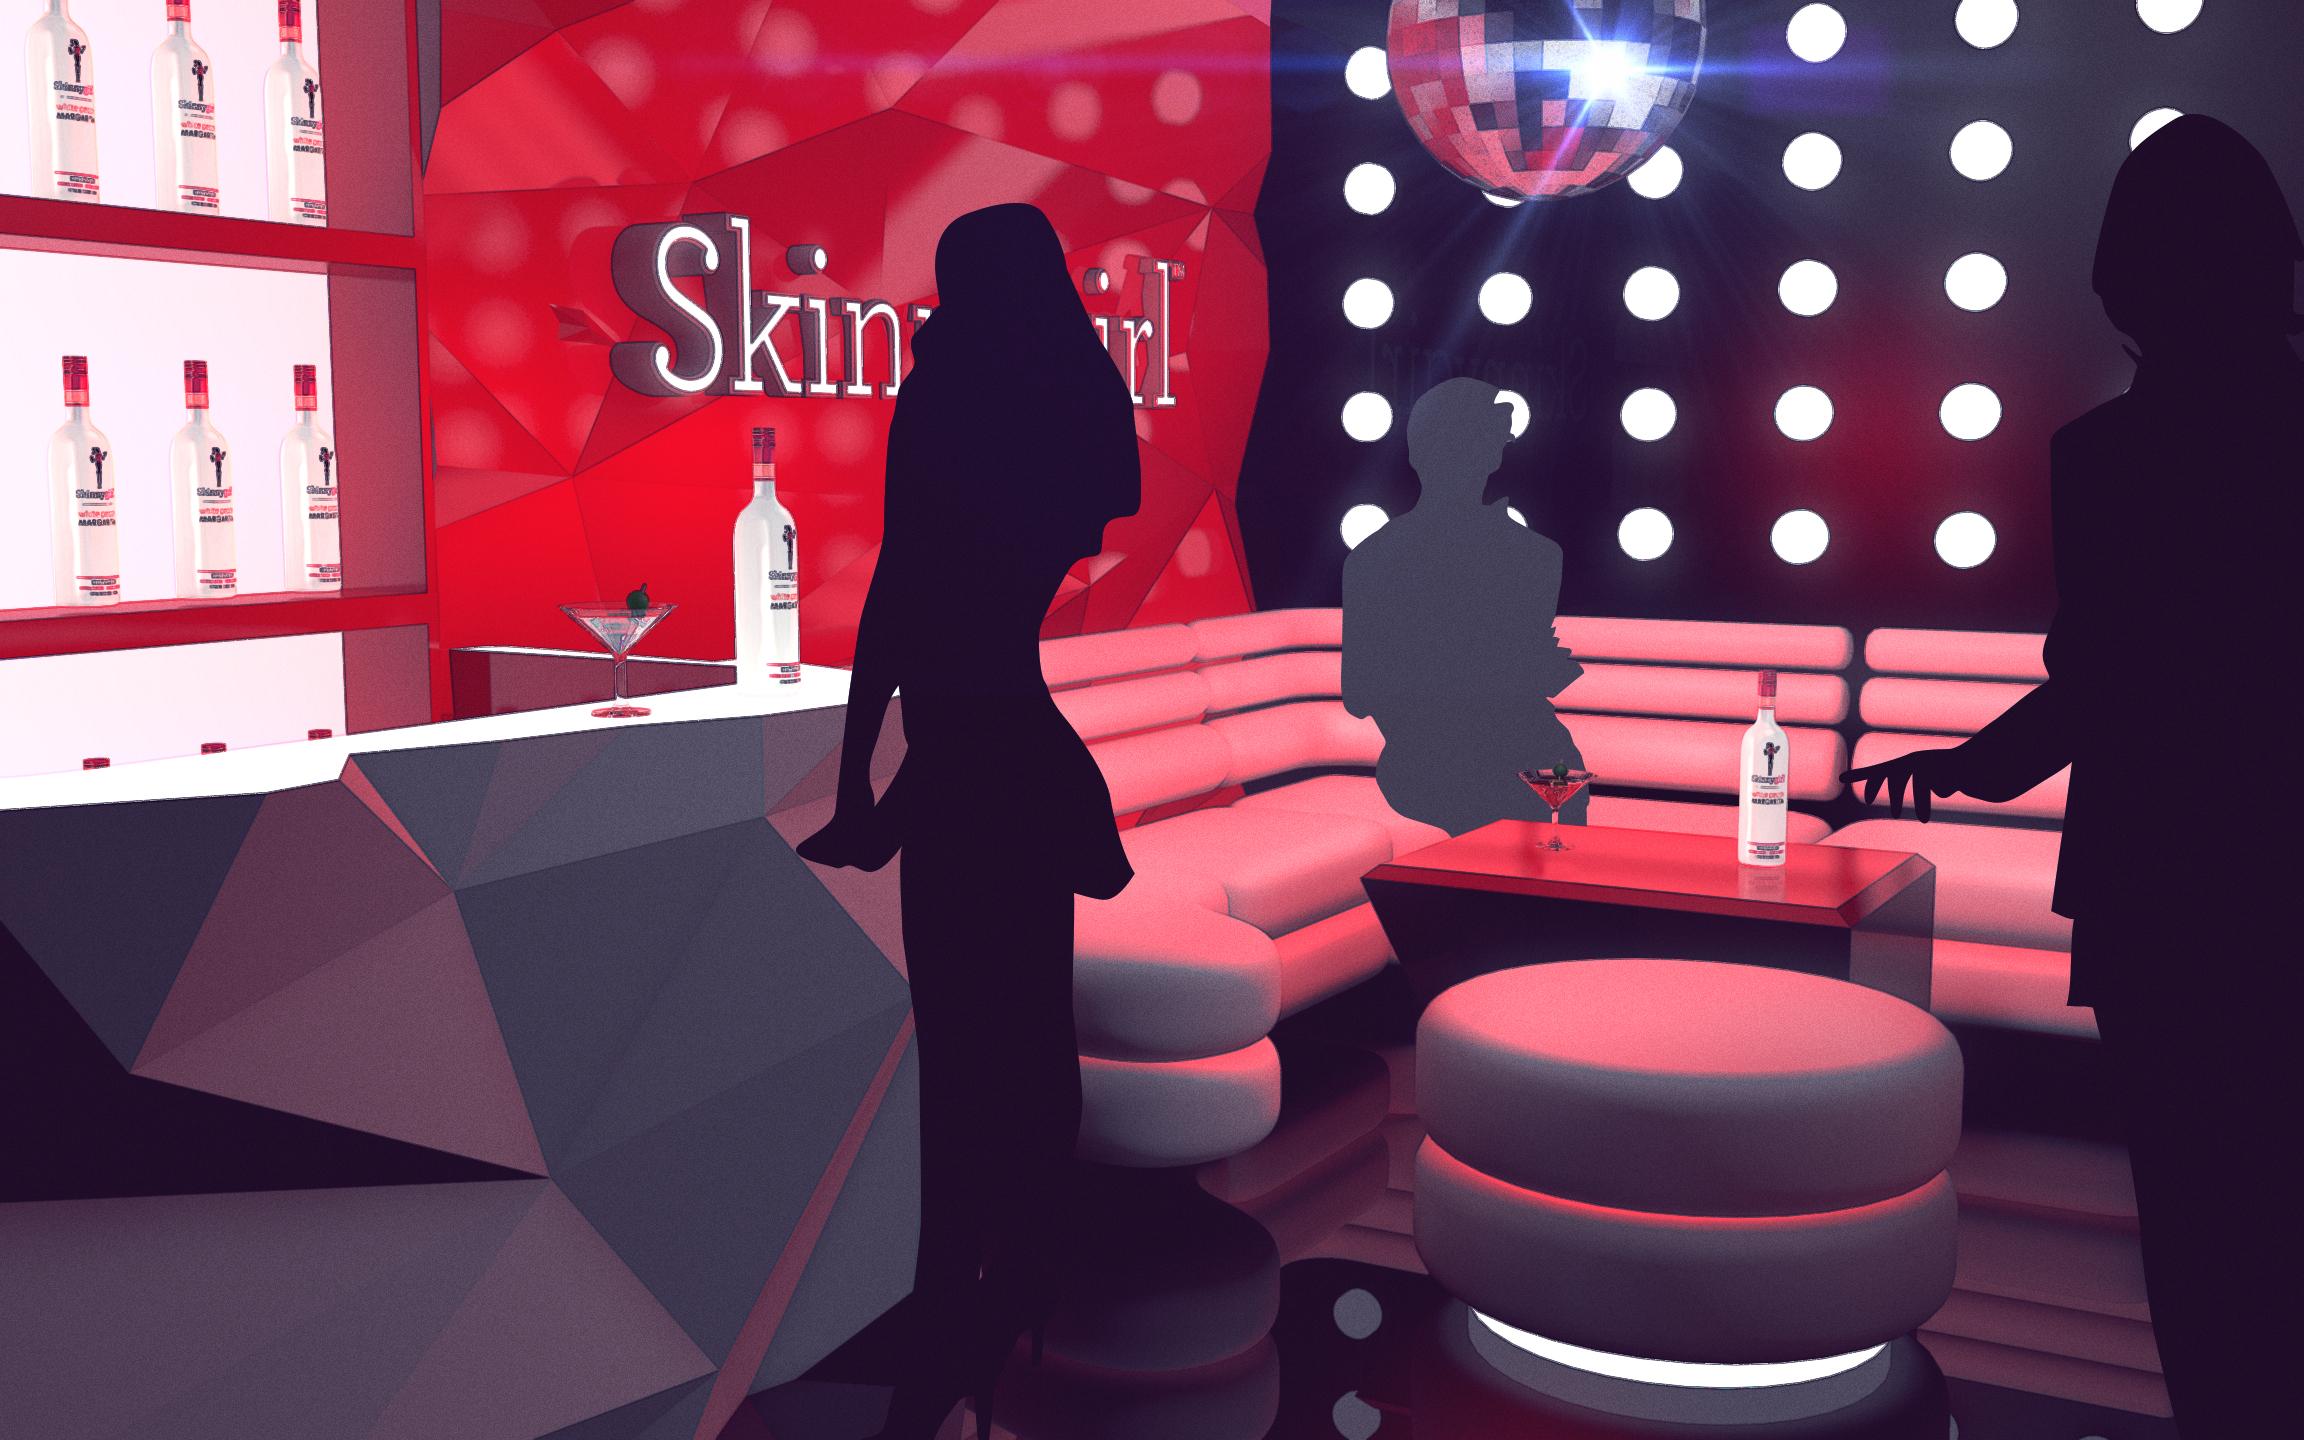 Skinnygirl_Booth_03.jpg